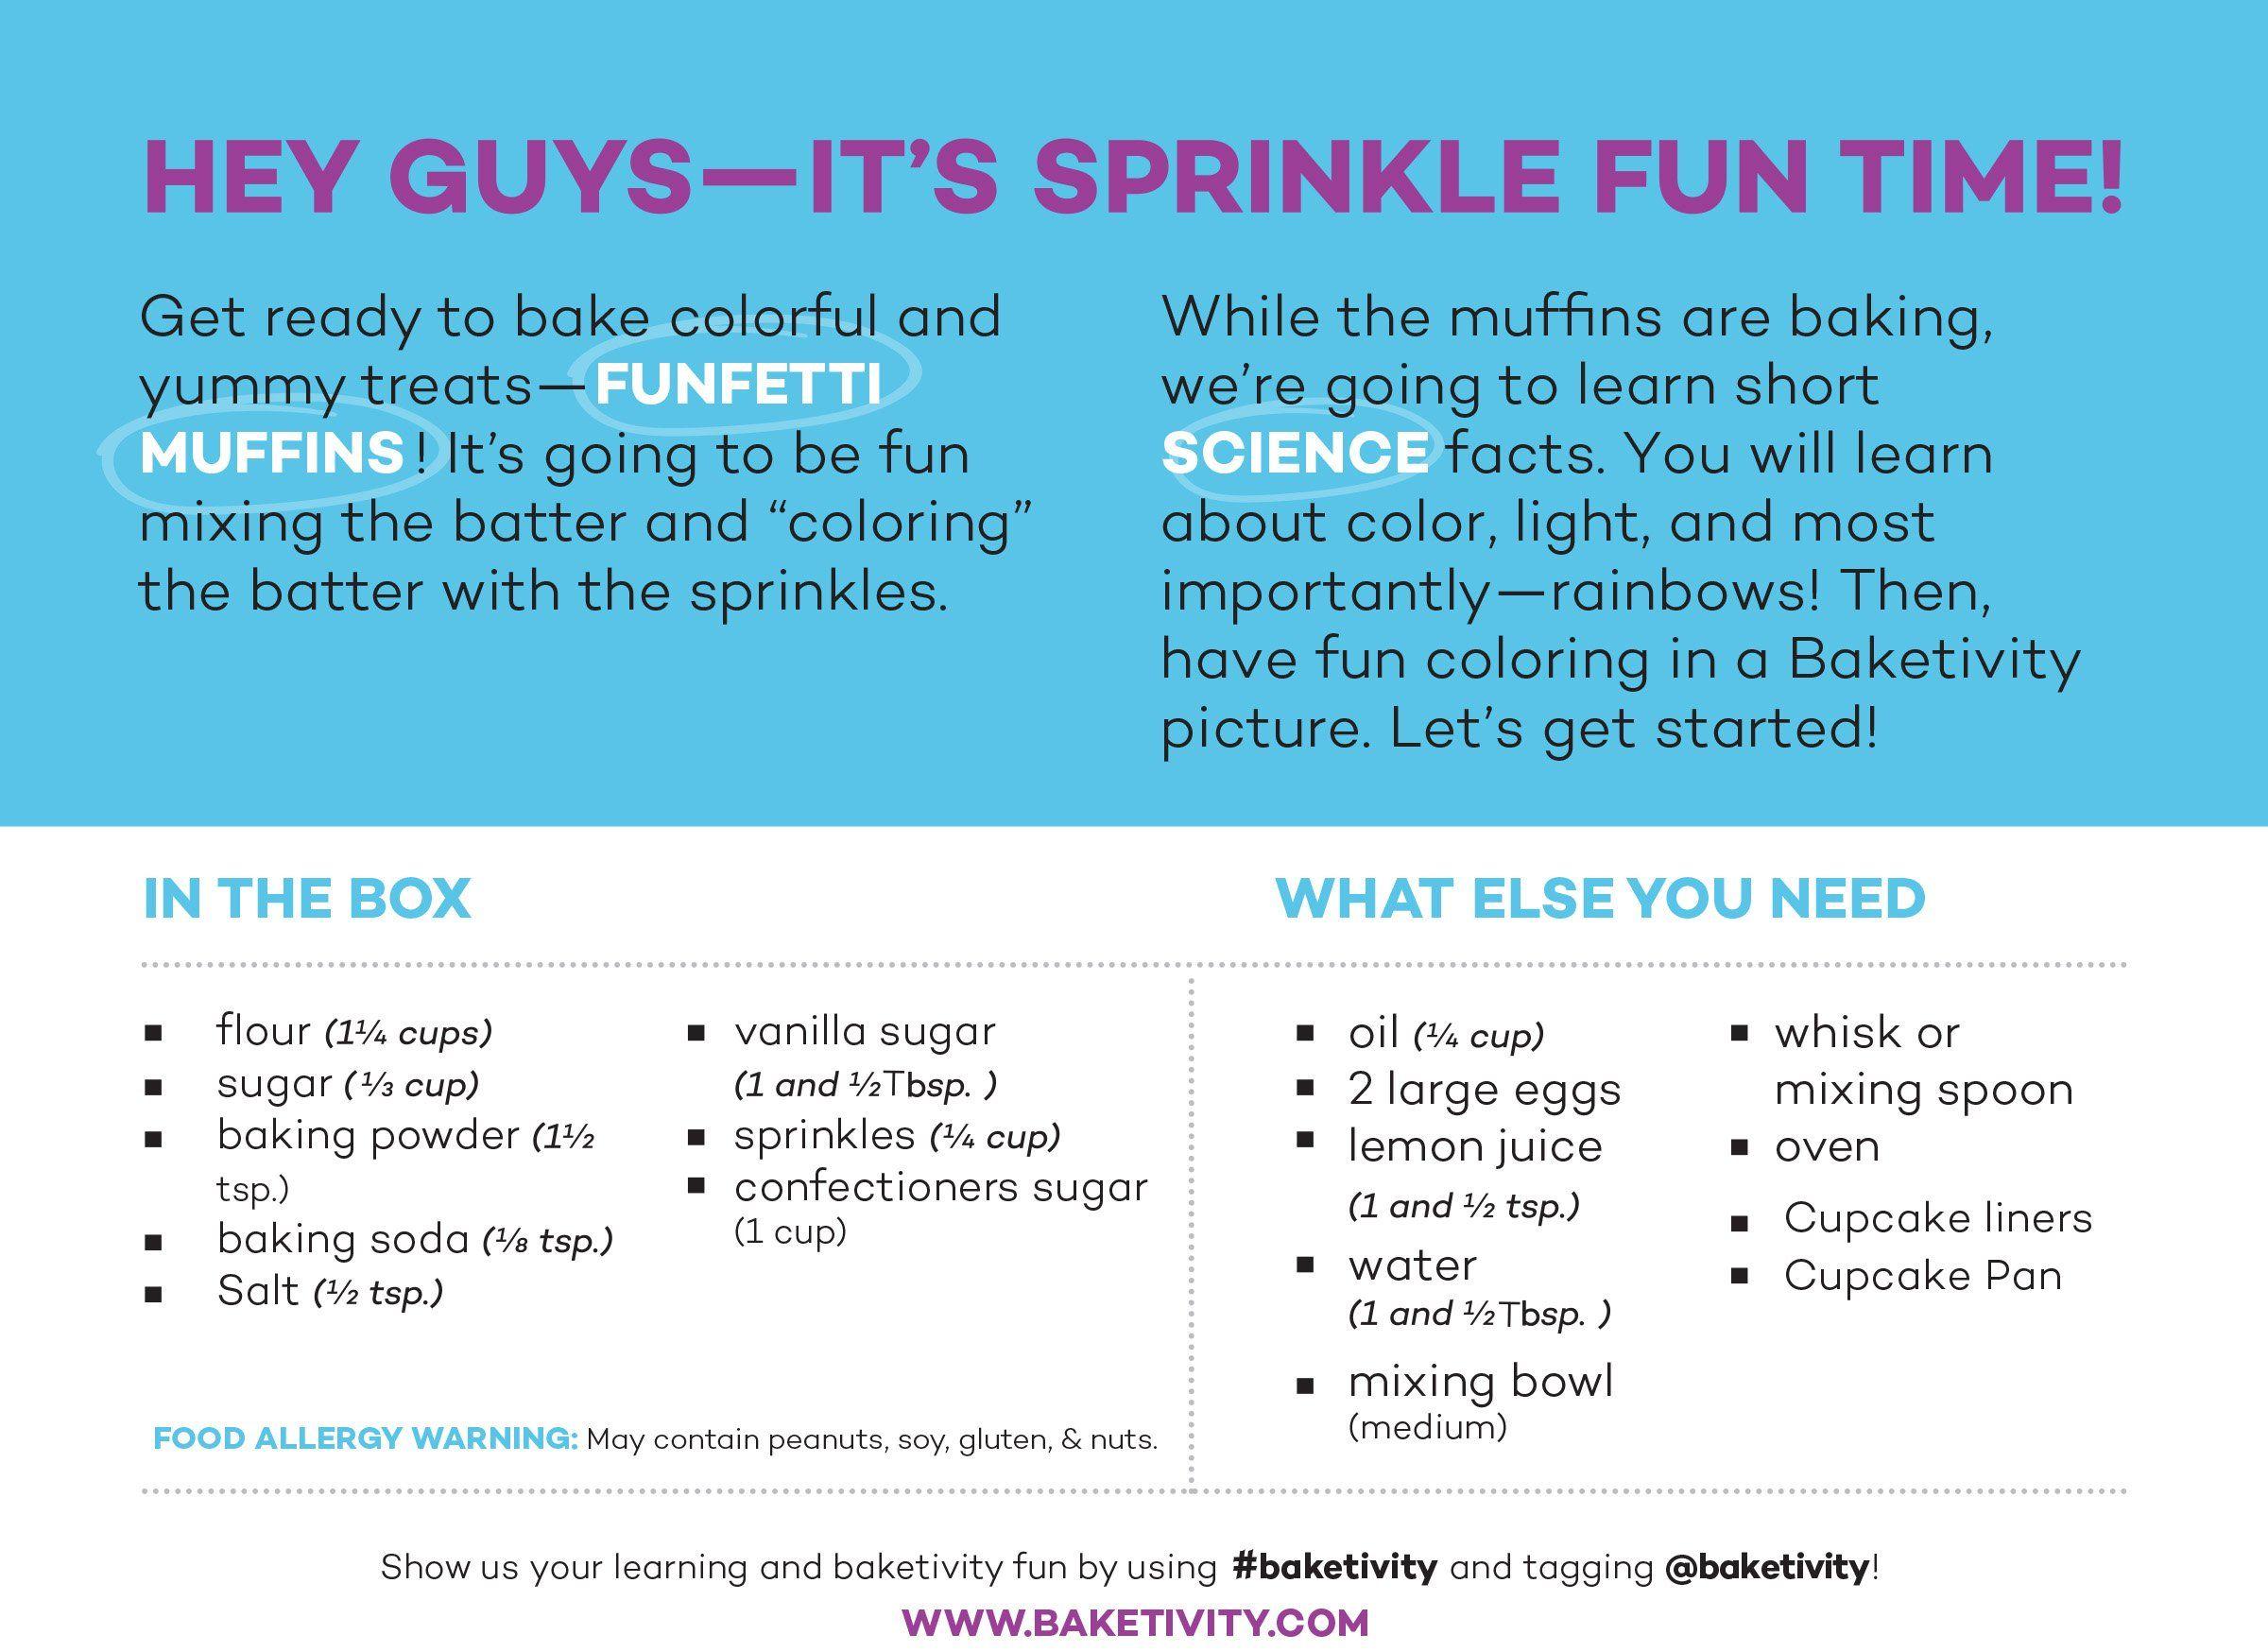 Baketivity kids baking set meal cooking party supply kit